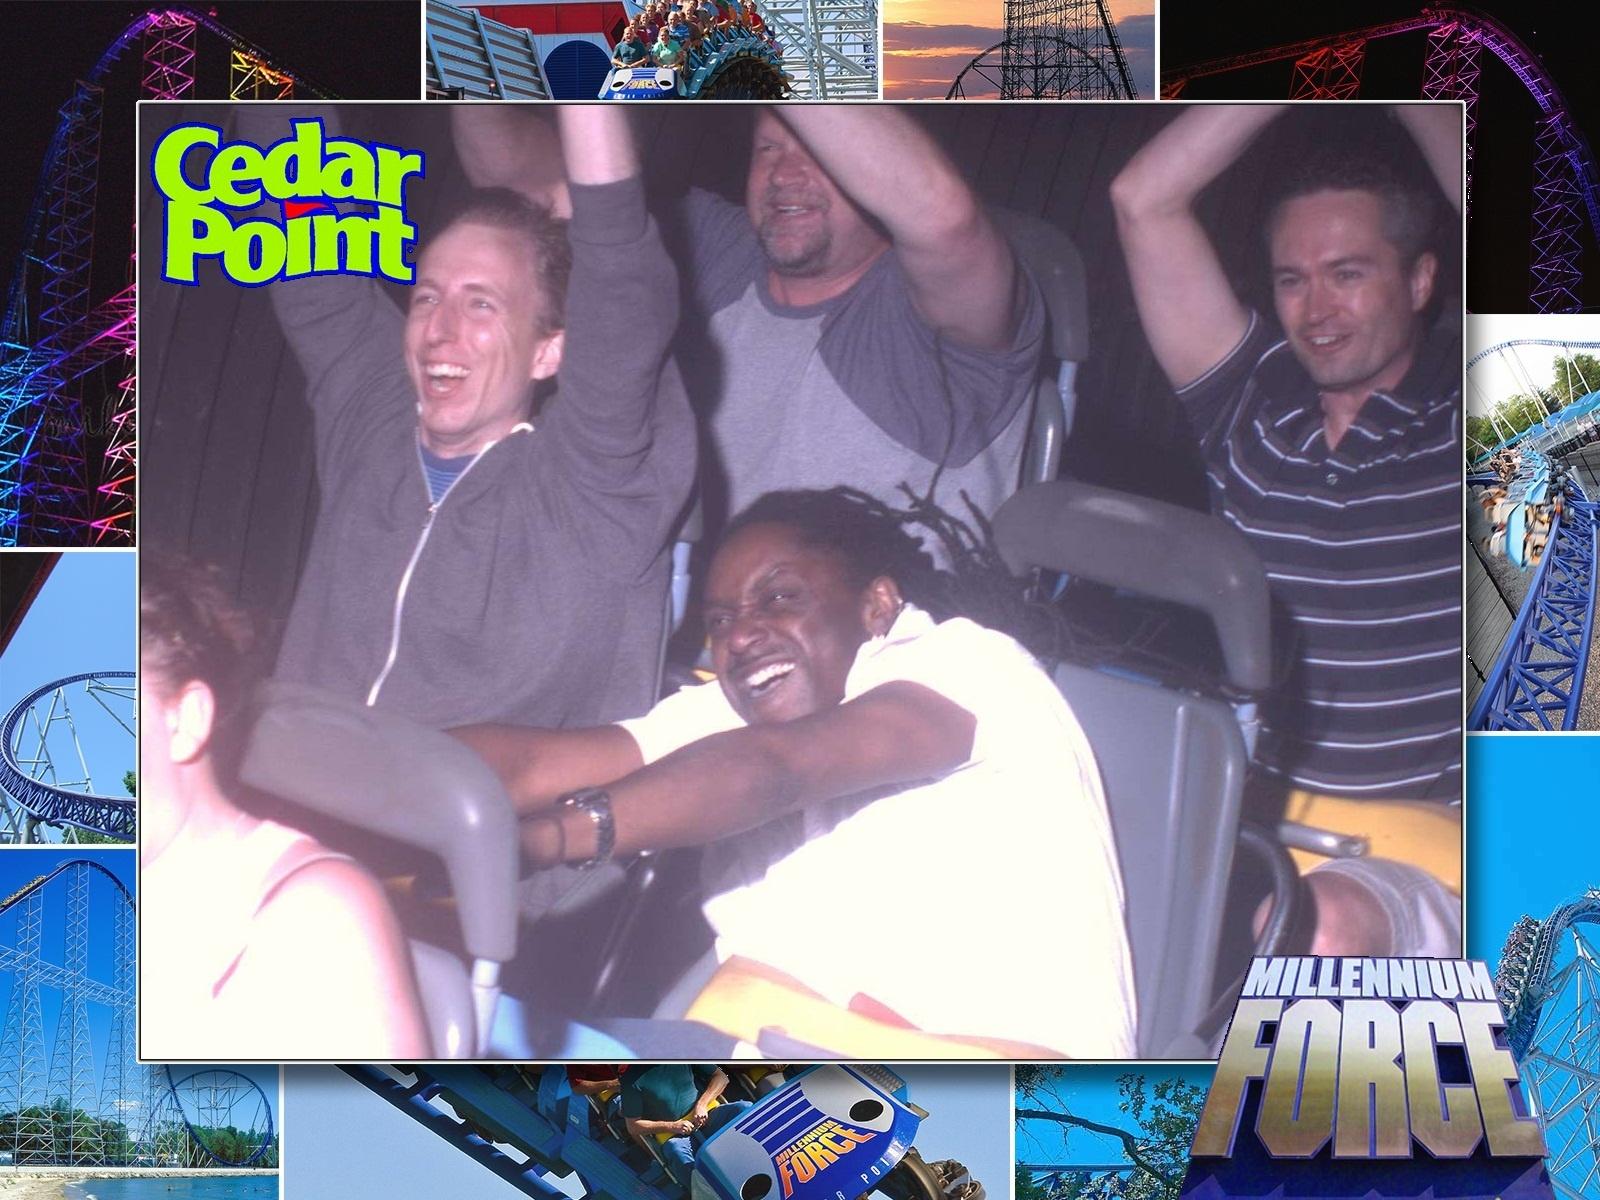 IGI careers team at cedar point roller coaster